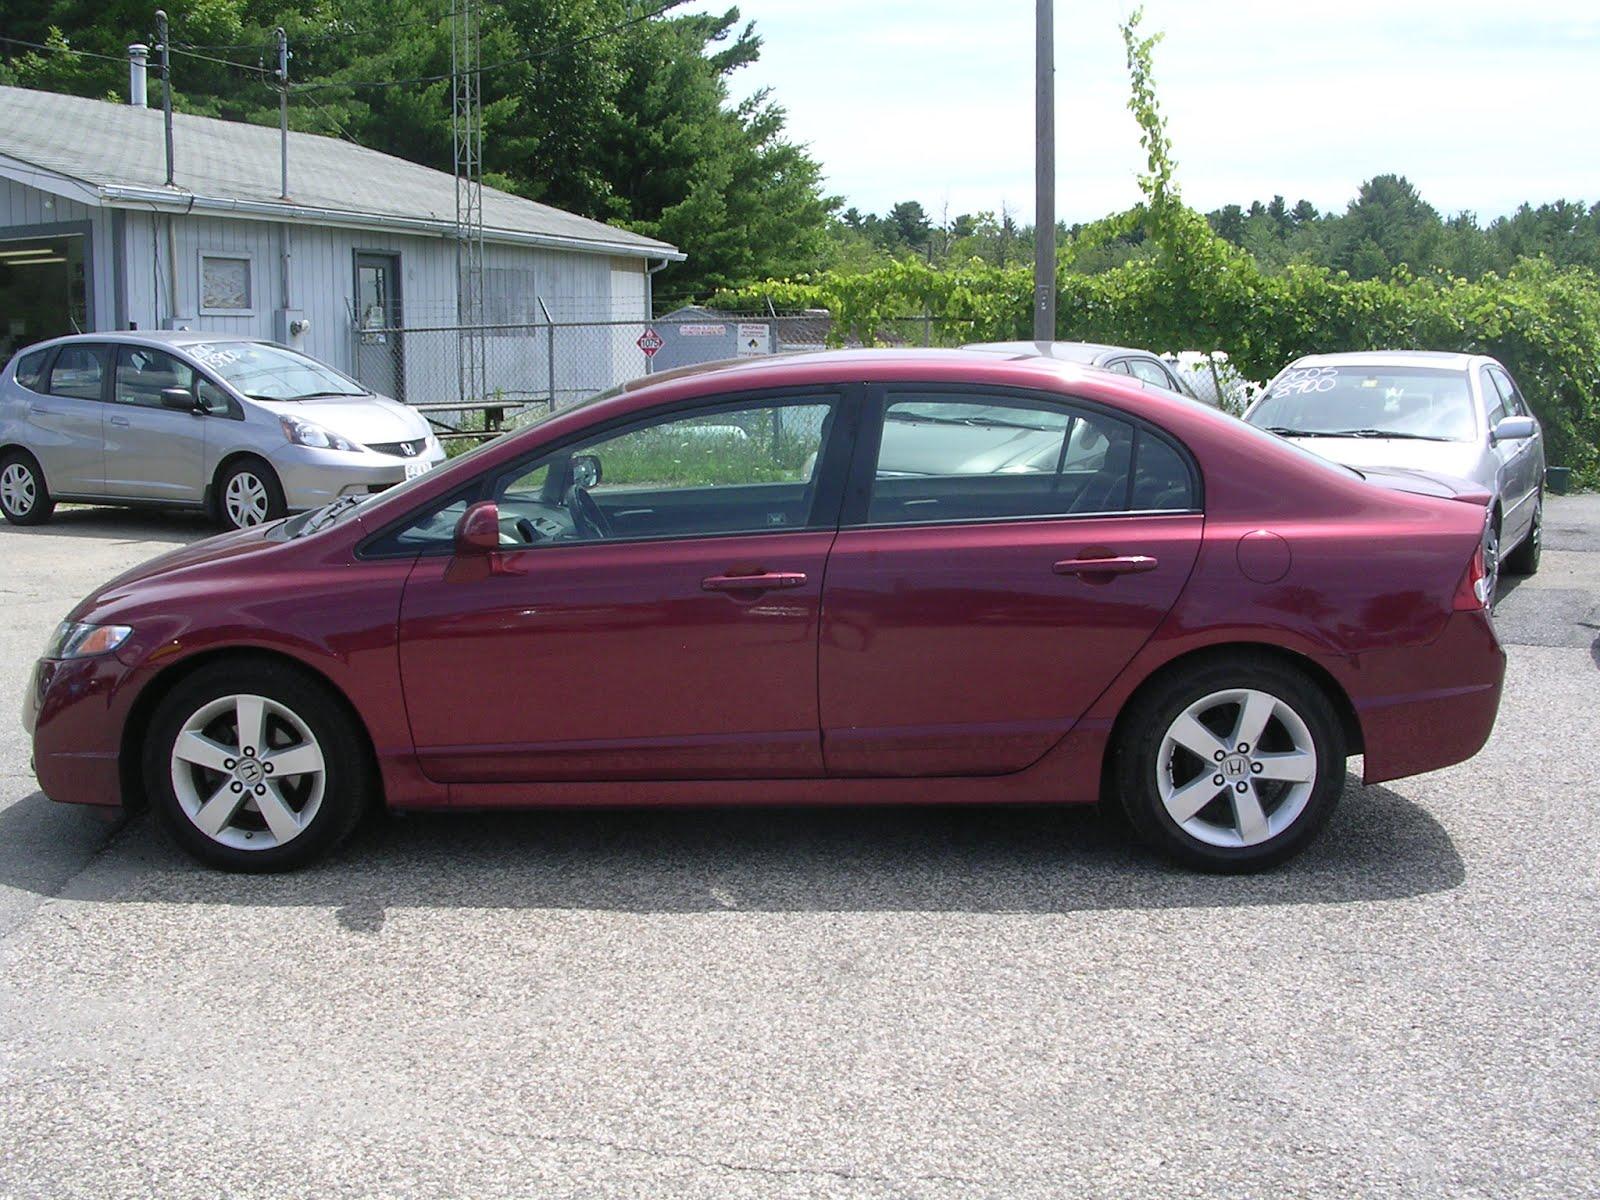 Earthy Cars Blog: August 2012